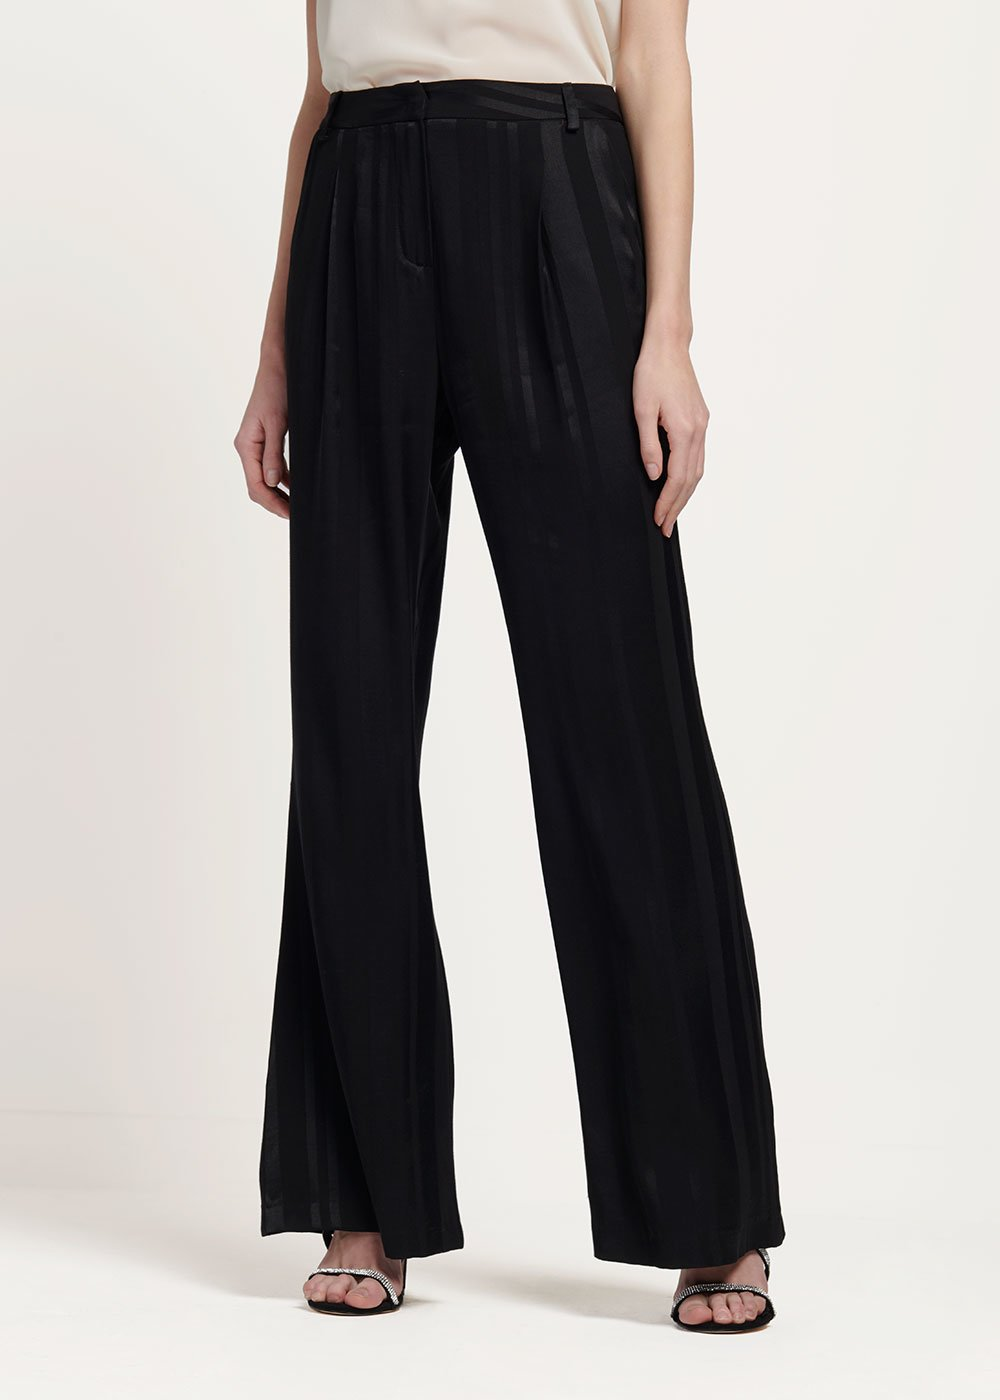 Pantalone Portos tessuto rigato - Black - Donna